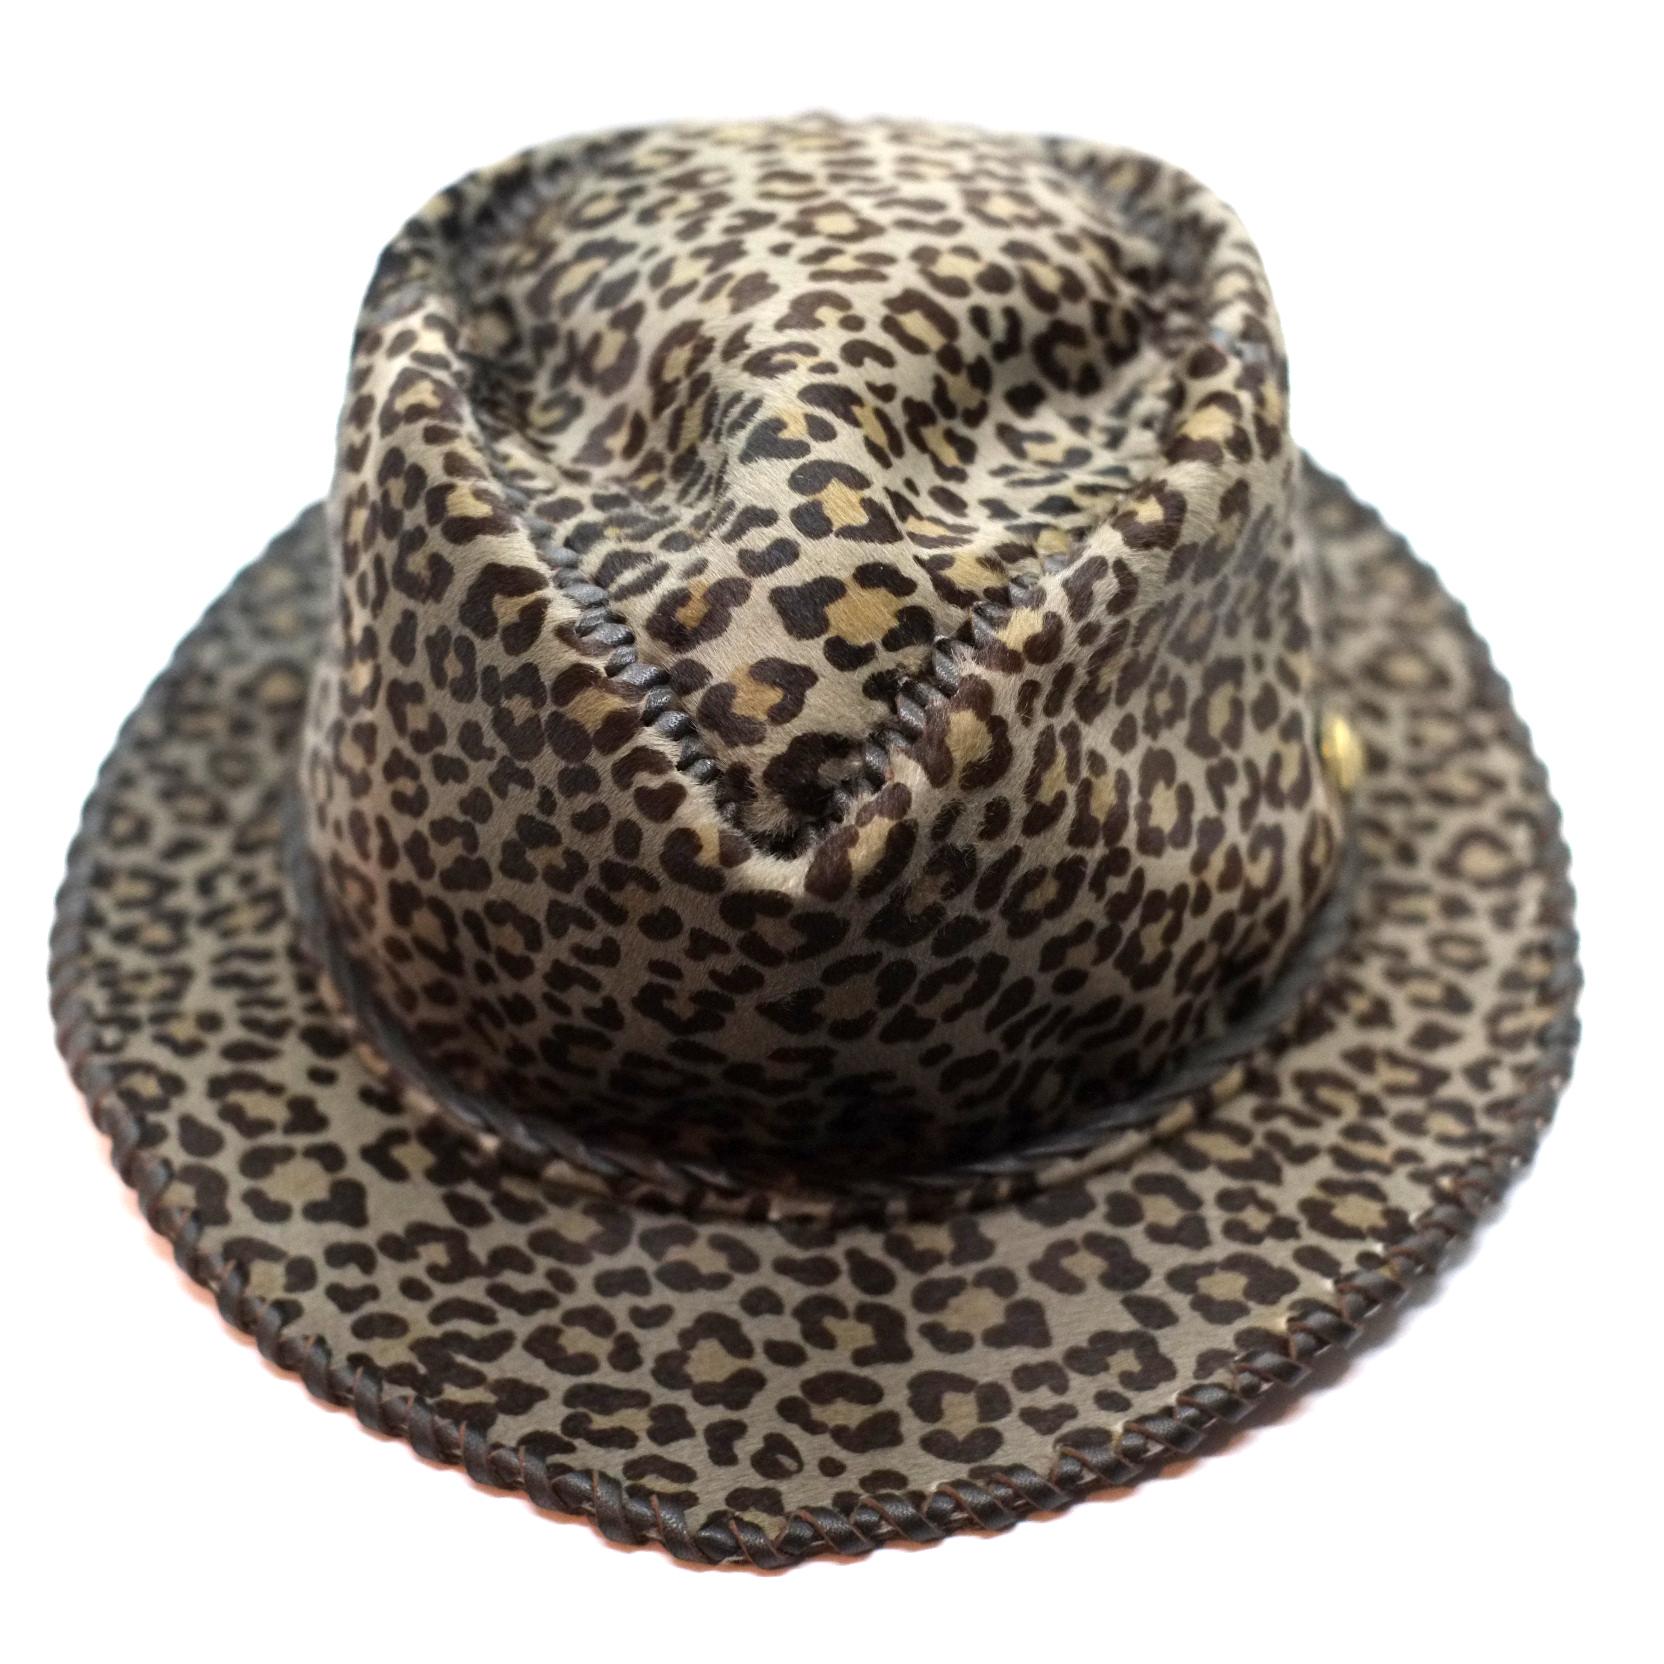 Premium-Bal-Hat-Neo レオパード(真鍮ロゴコンチョ付)・1個限定(Mサイズ58cm)